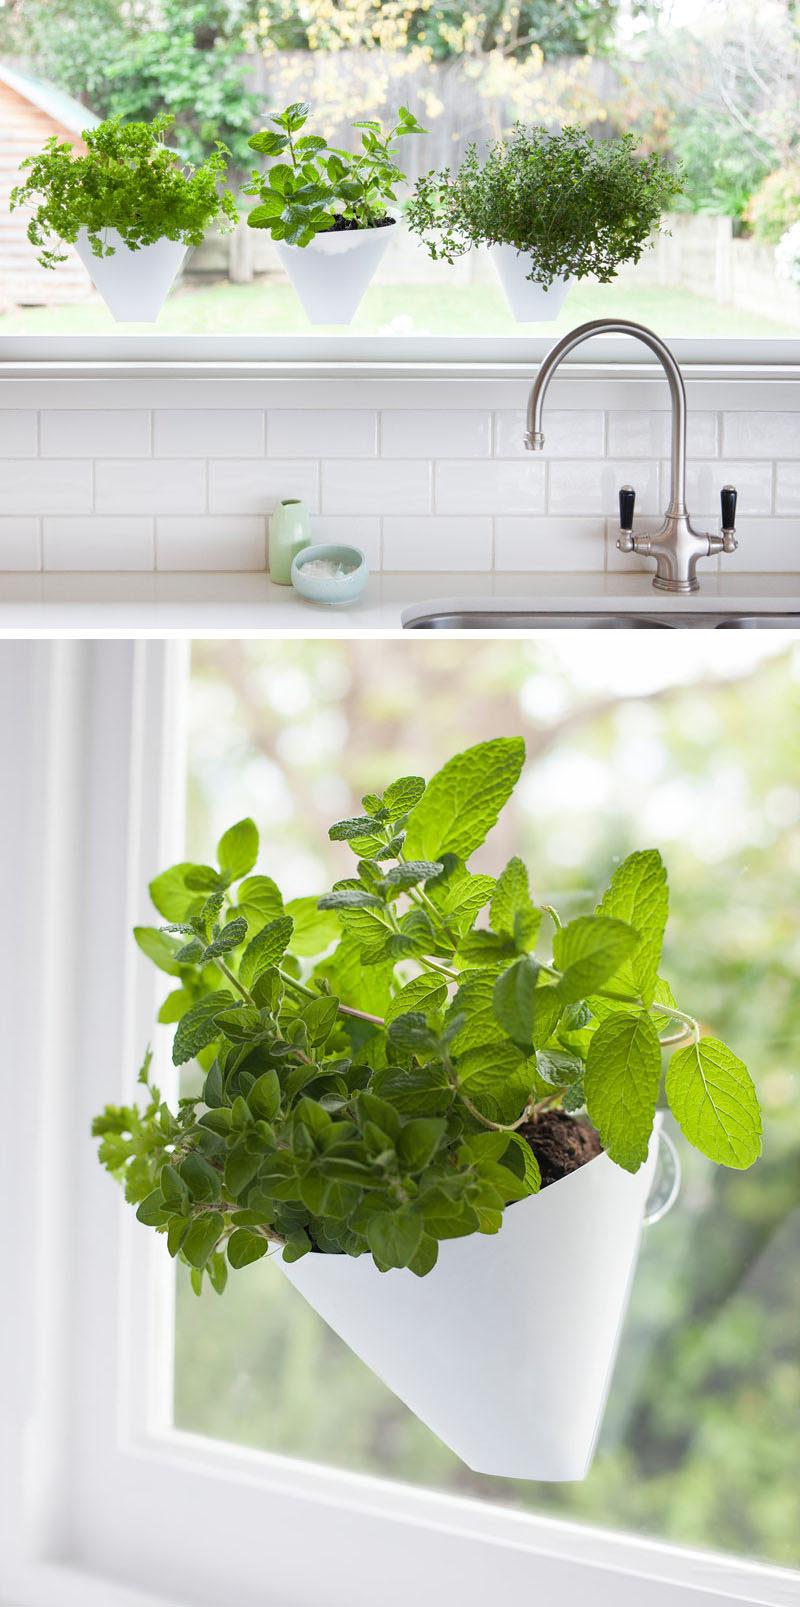 Indoor Garden Idea - Hang Your Plants From The Ceiling ... on Hanging Plant Pots Indoor  id=88343